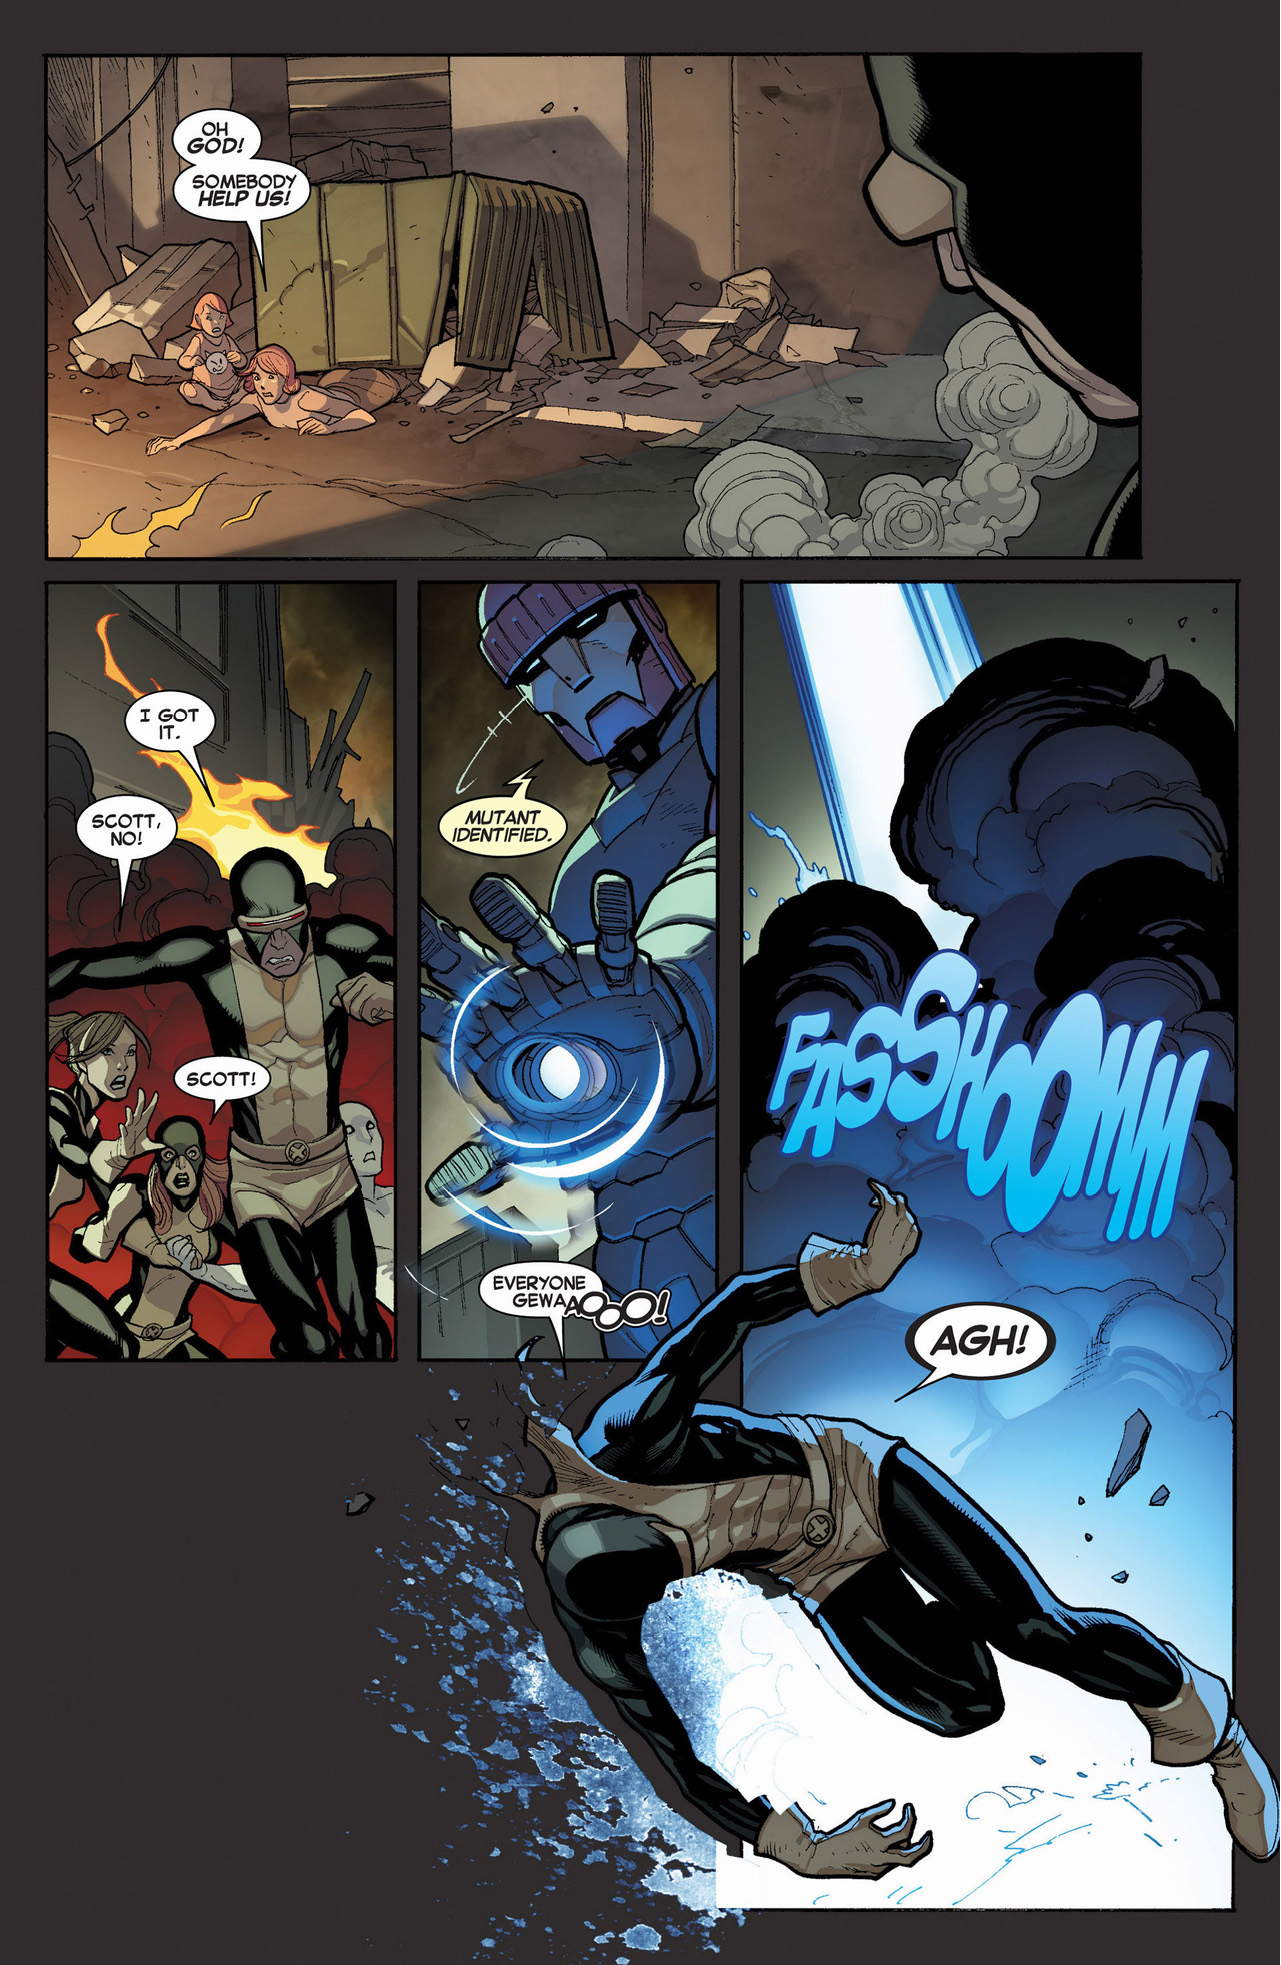 cyclops's team helps out the original 5 x-men